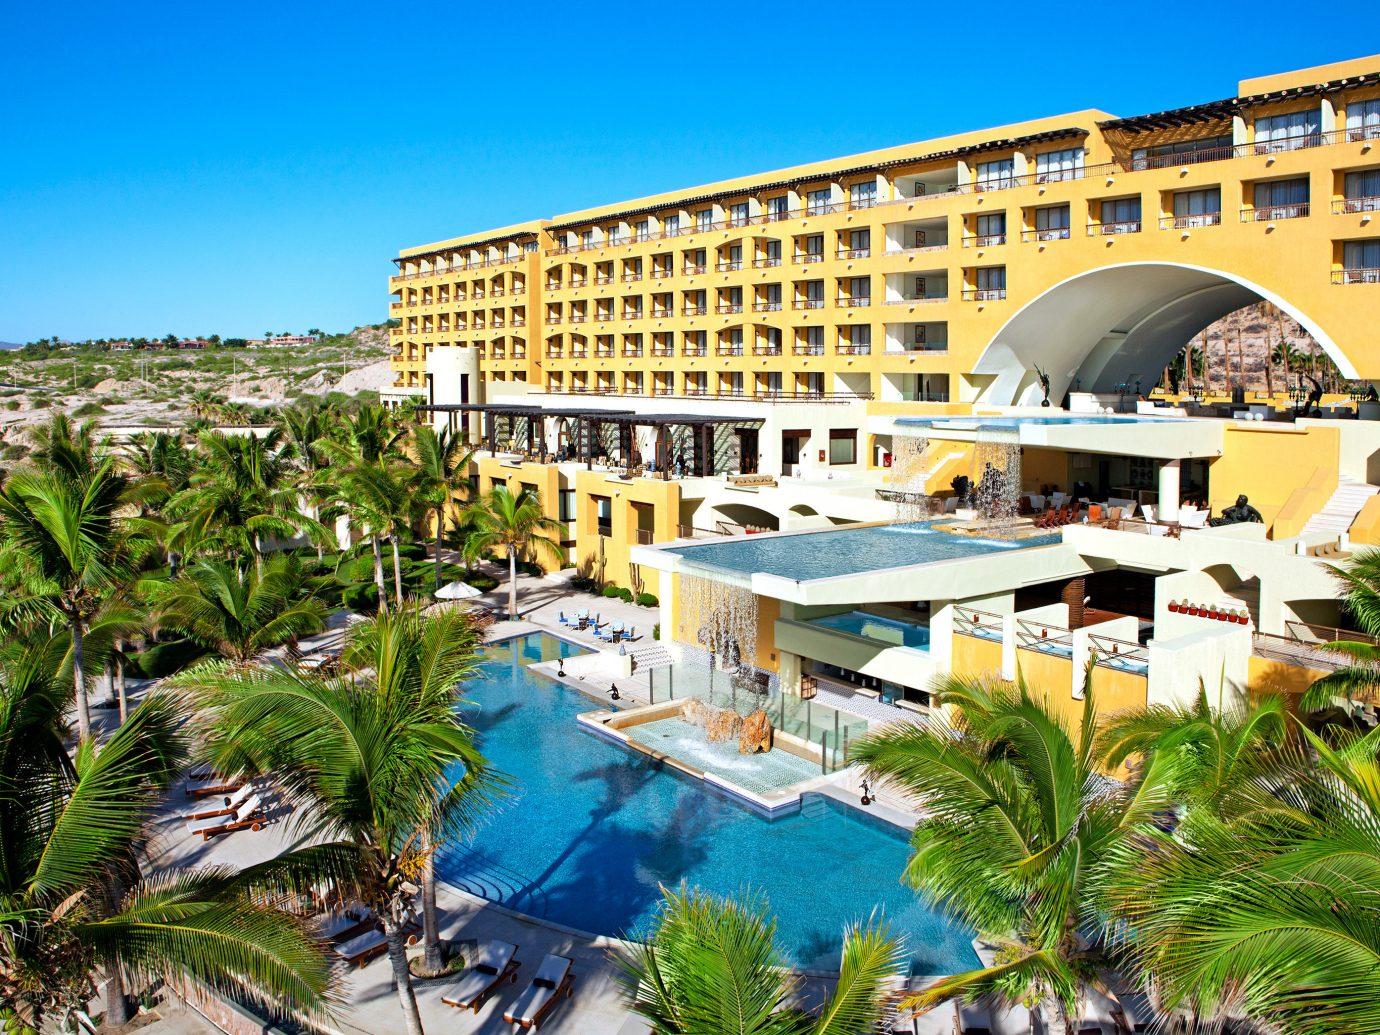 Exterior view of Marquis Los Cabos All-Inclusive Resort & Spa